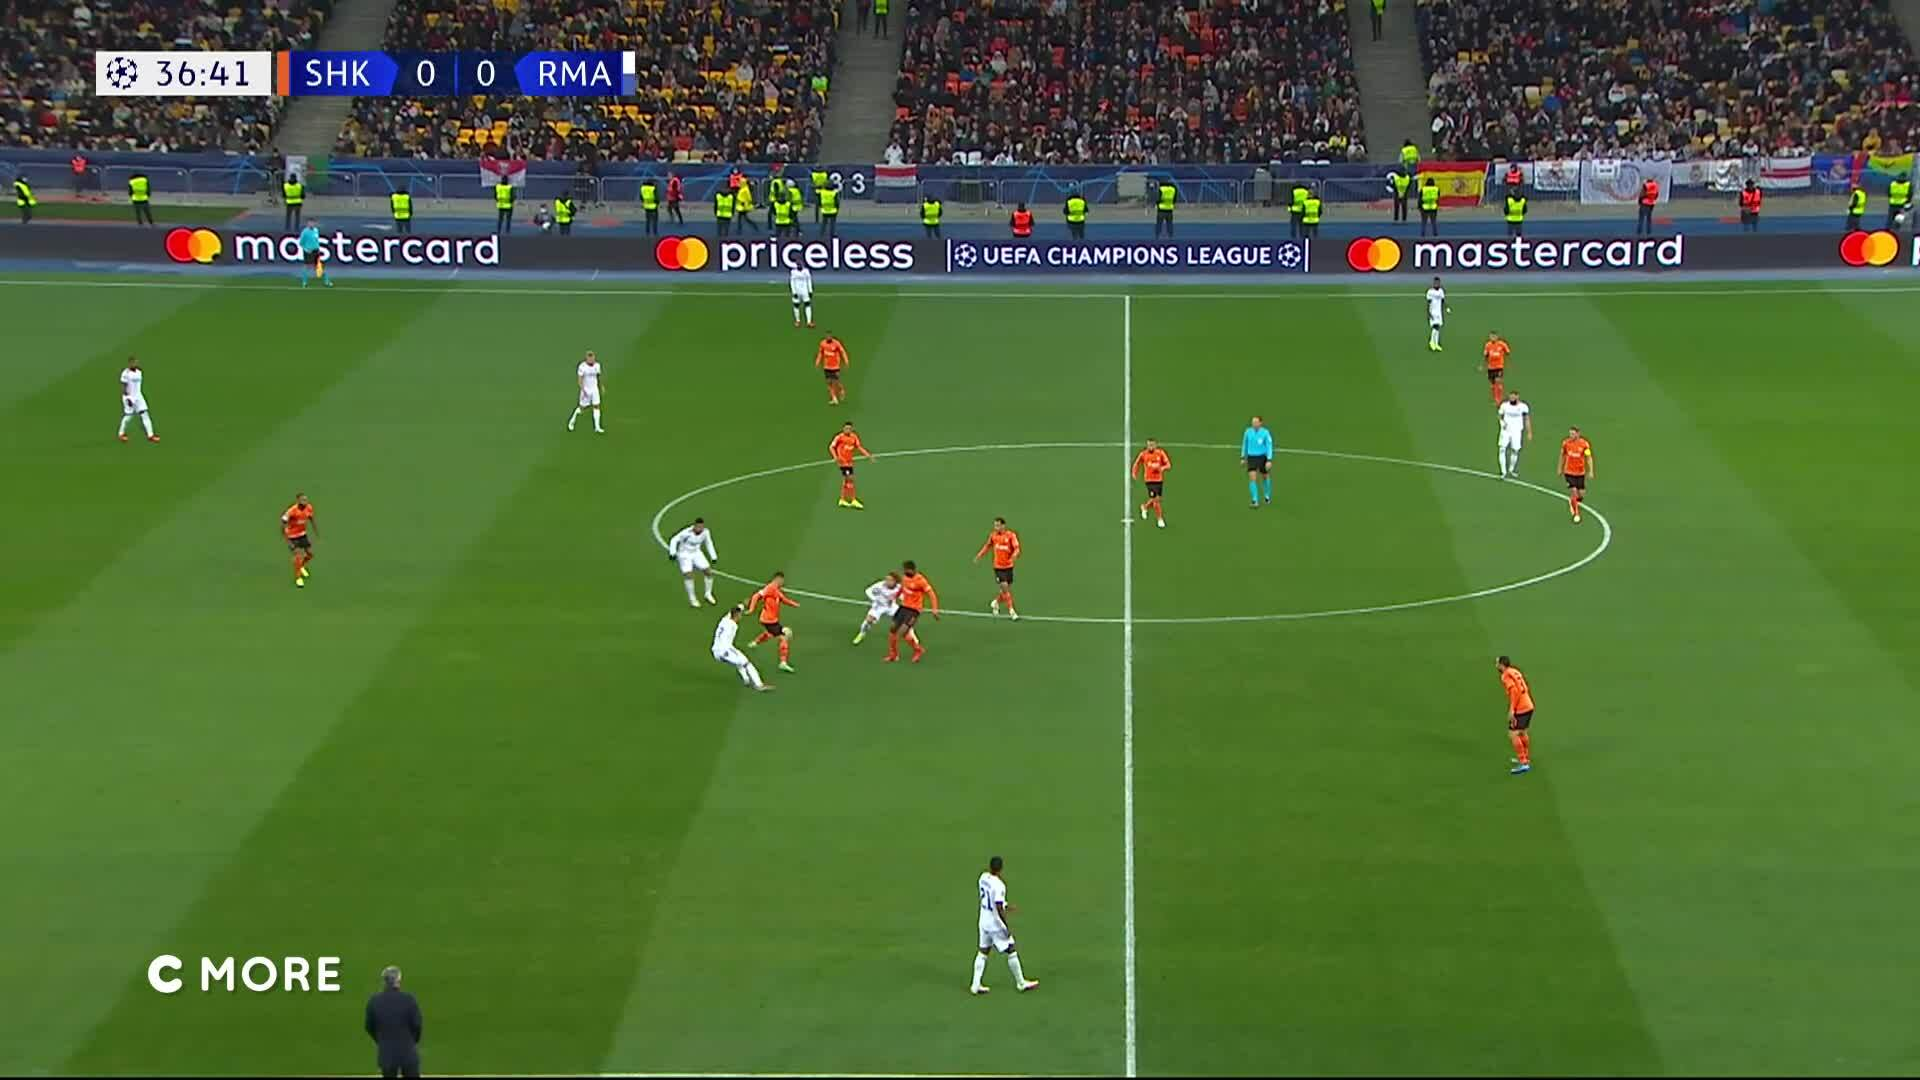 Mestarien liiga, Maalikooste: Shakhtar Donetsk - Real Madrid